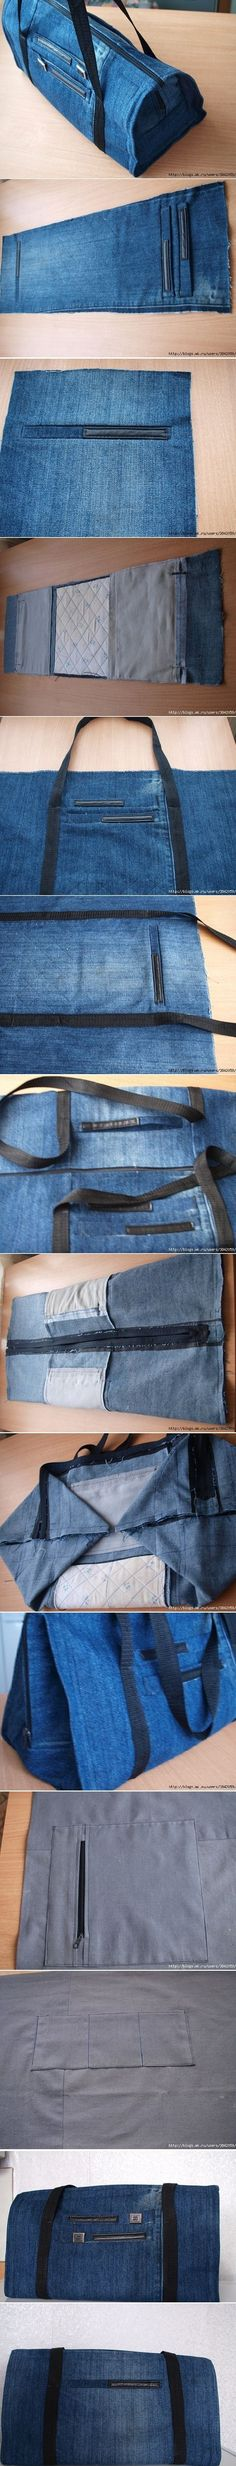 DIY Handbag Jeans         ~          GOODIY